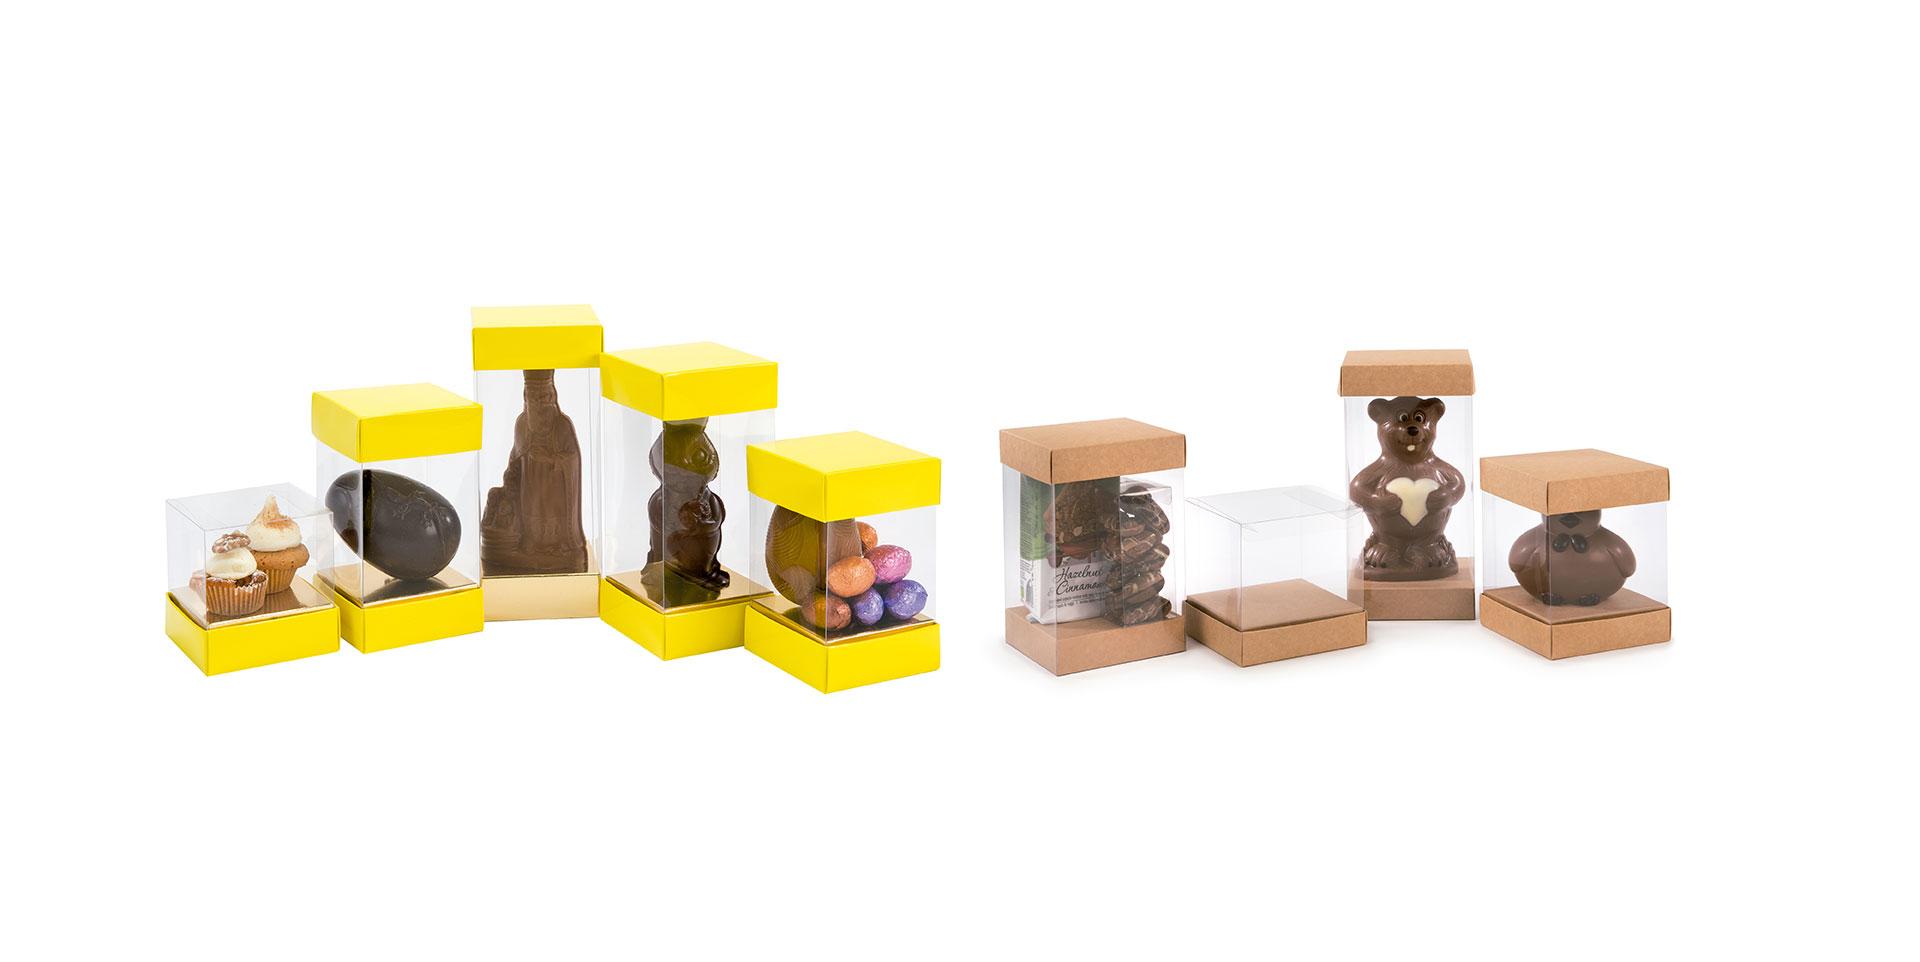 ChocoBox-cajas-estandar-para-bombones-1.jpg